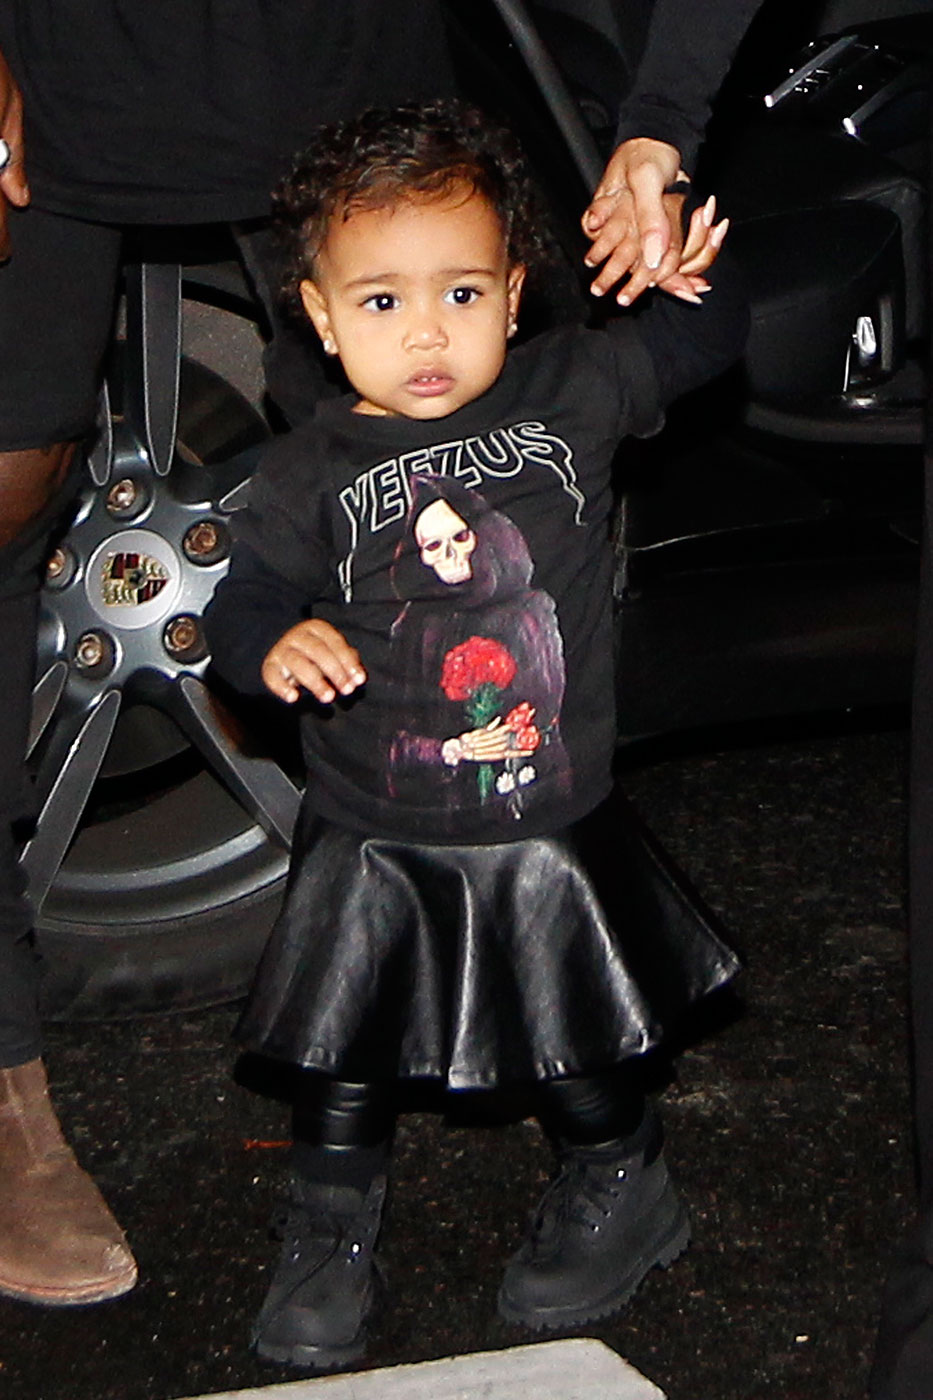 Kanye West, Kim Kardashian and their daughter North West walk to the Balenciaga Womenswear Spring/Summer 2015 during Paris Fashion Week in Paris, France on Sept. 24, 2014.